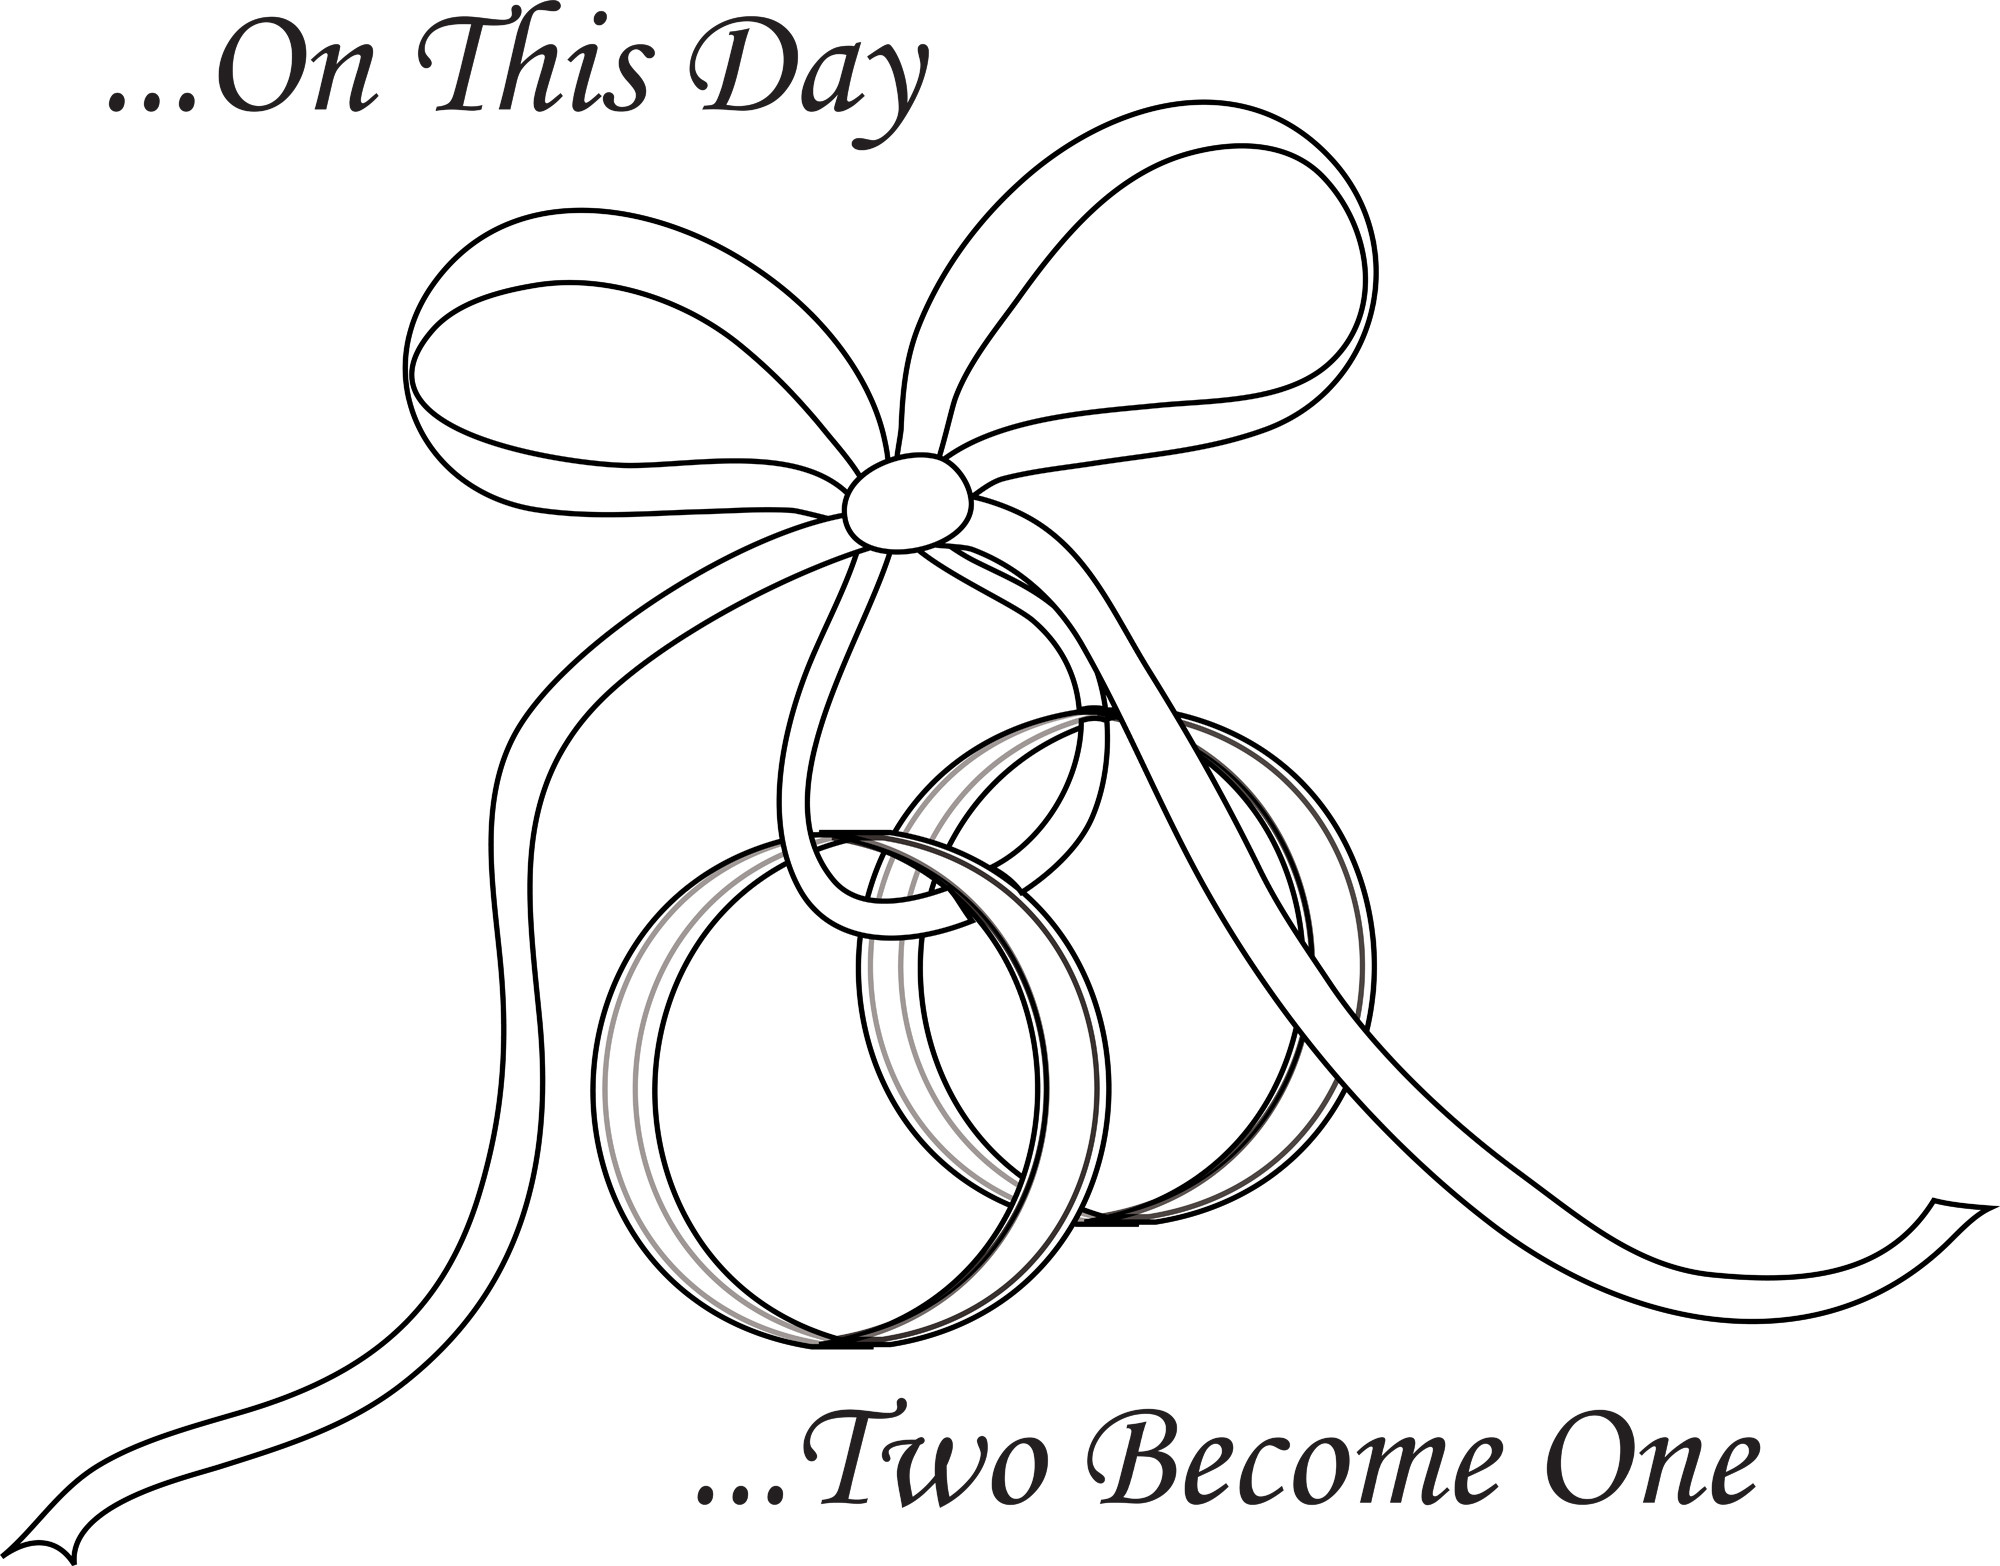 Interlocking Wedding Rings Drawing At Getdrawings Com Free For